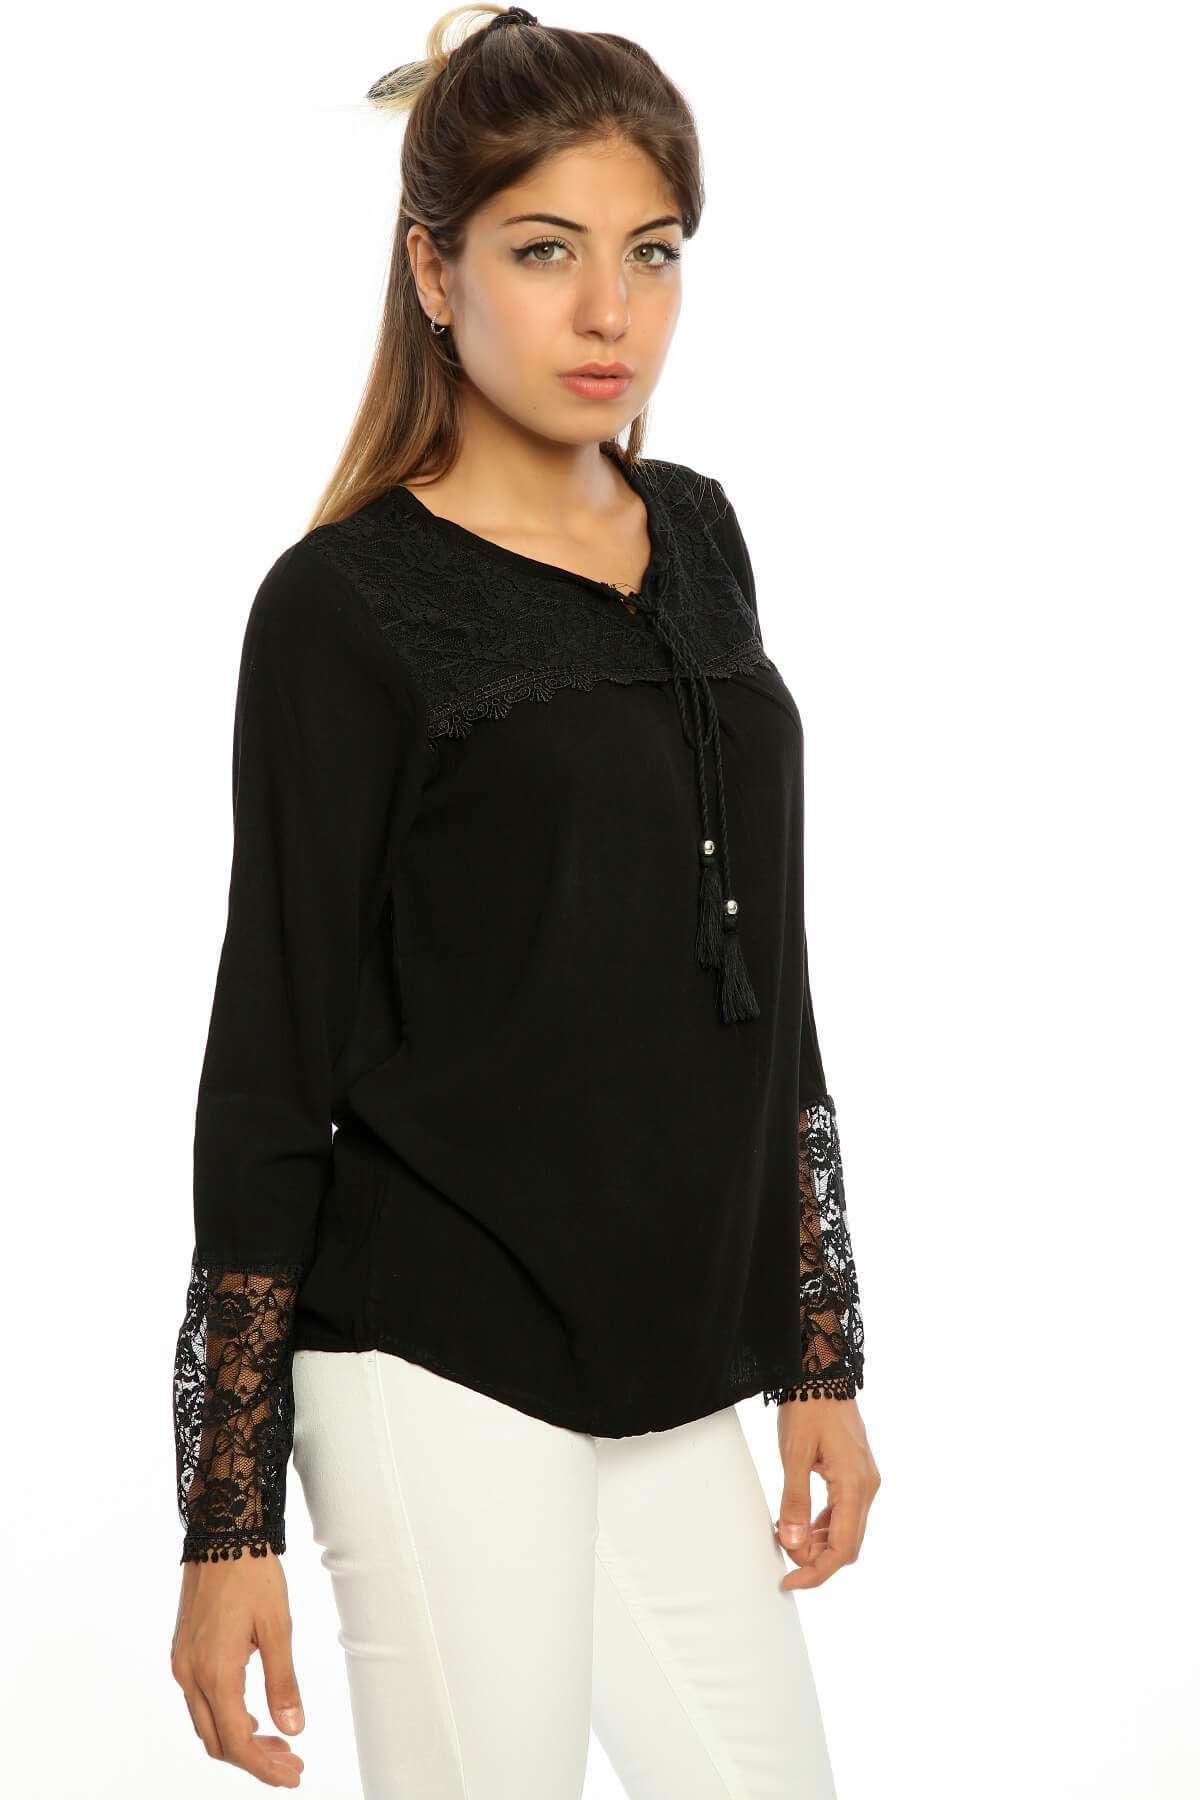 Yaka Kol Dantel İşleme Bluz Siyah